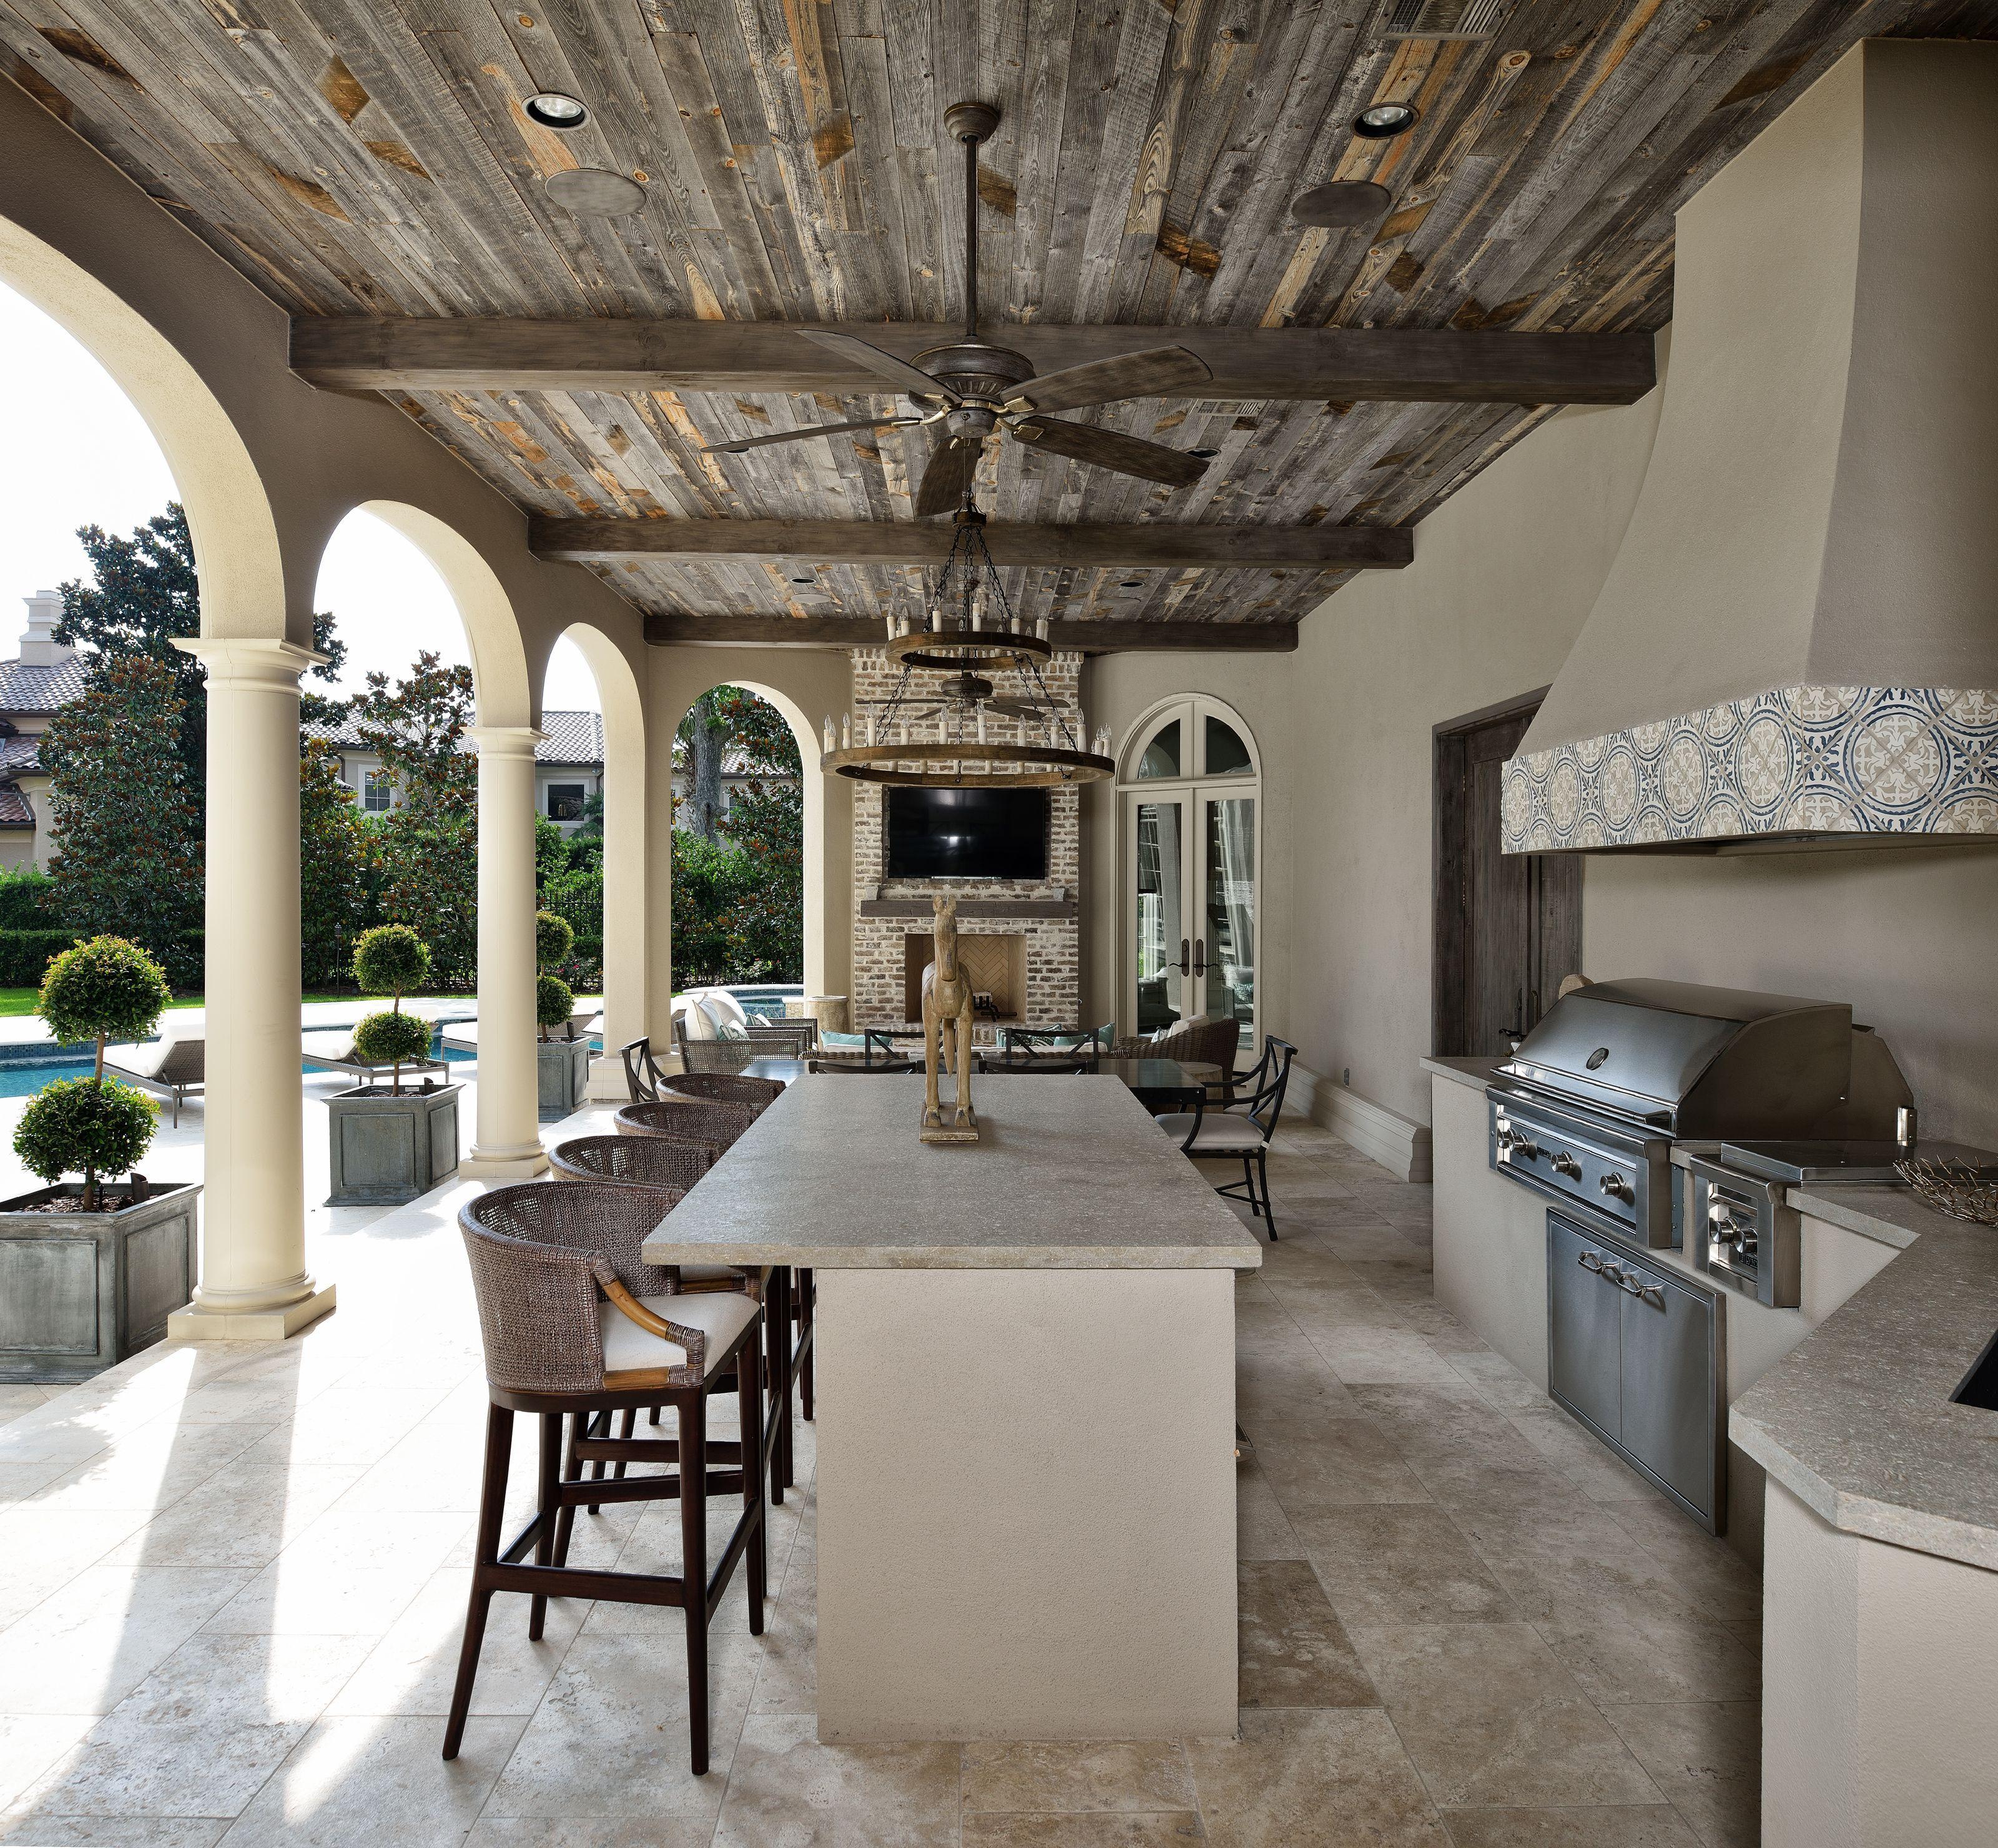 cindy witmer designs new home inspiration outdoor kitchen design rh pinterest com